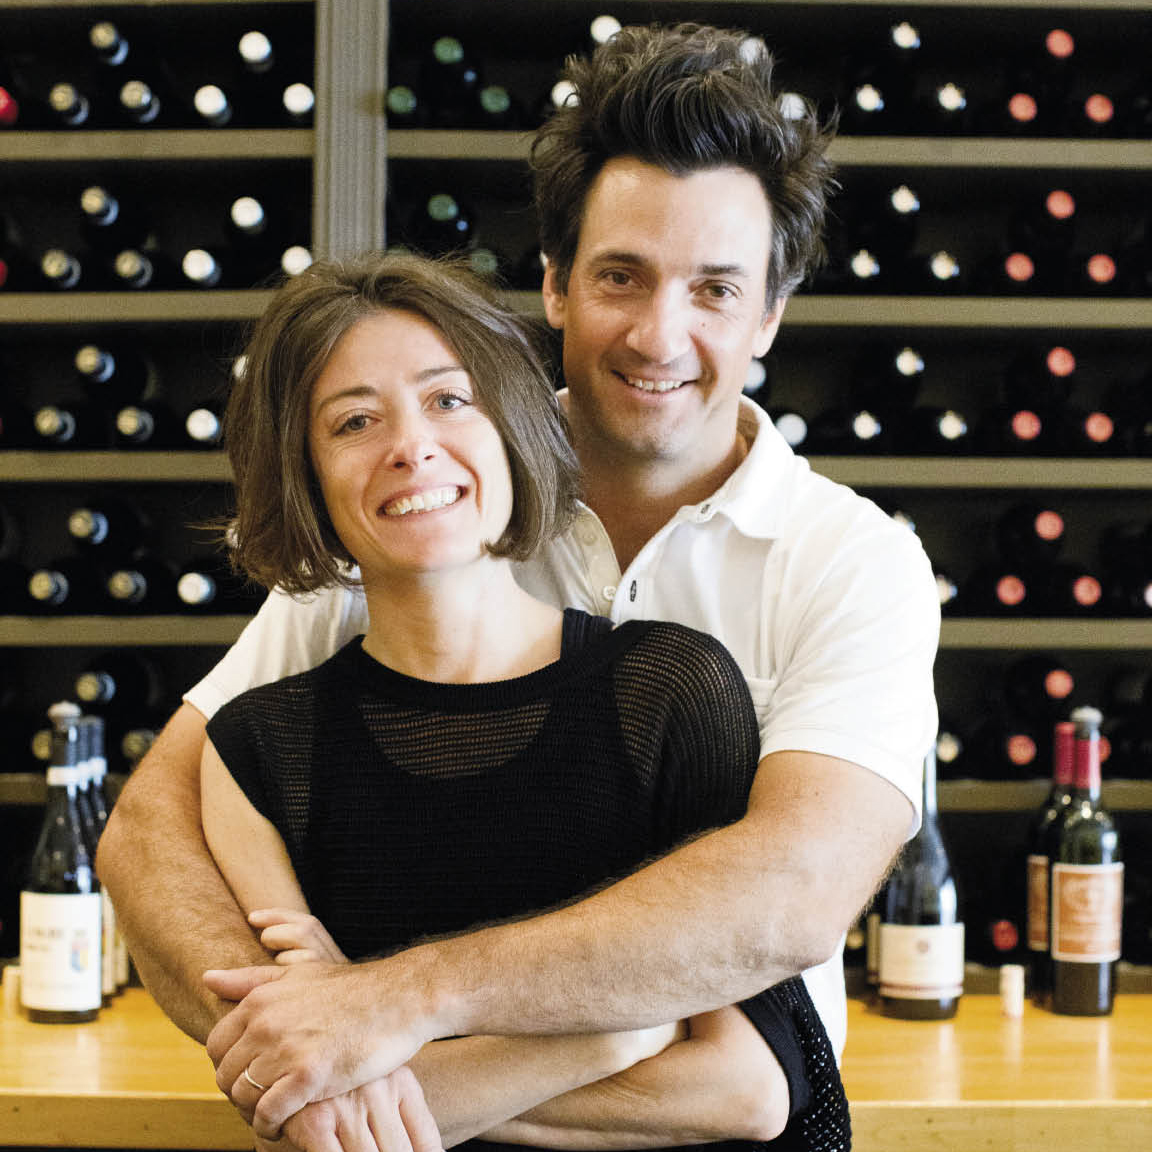 Patrick & Fanny Panella